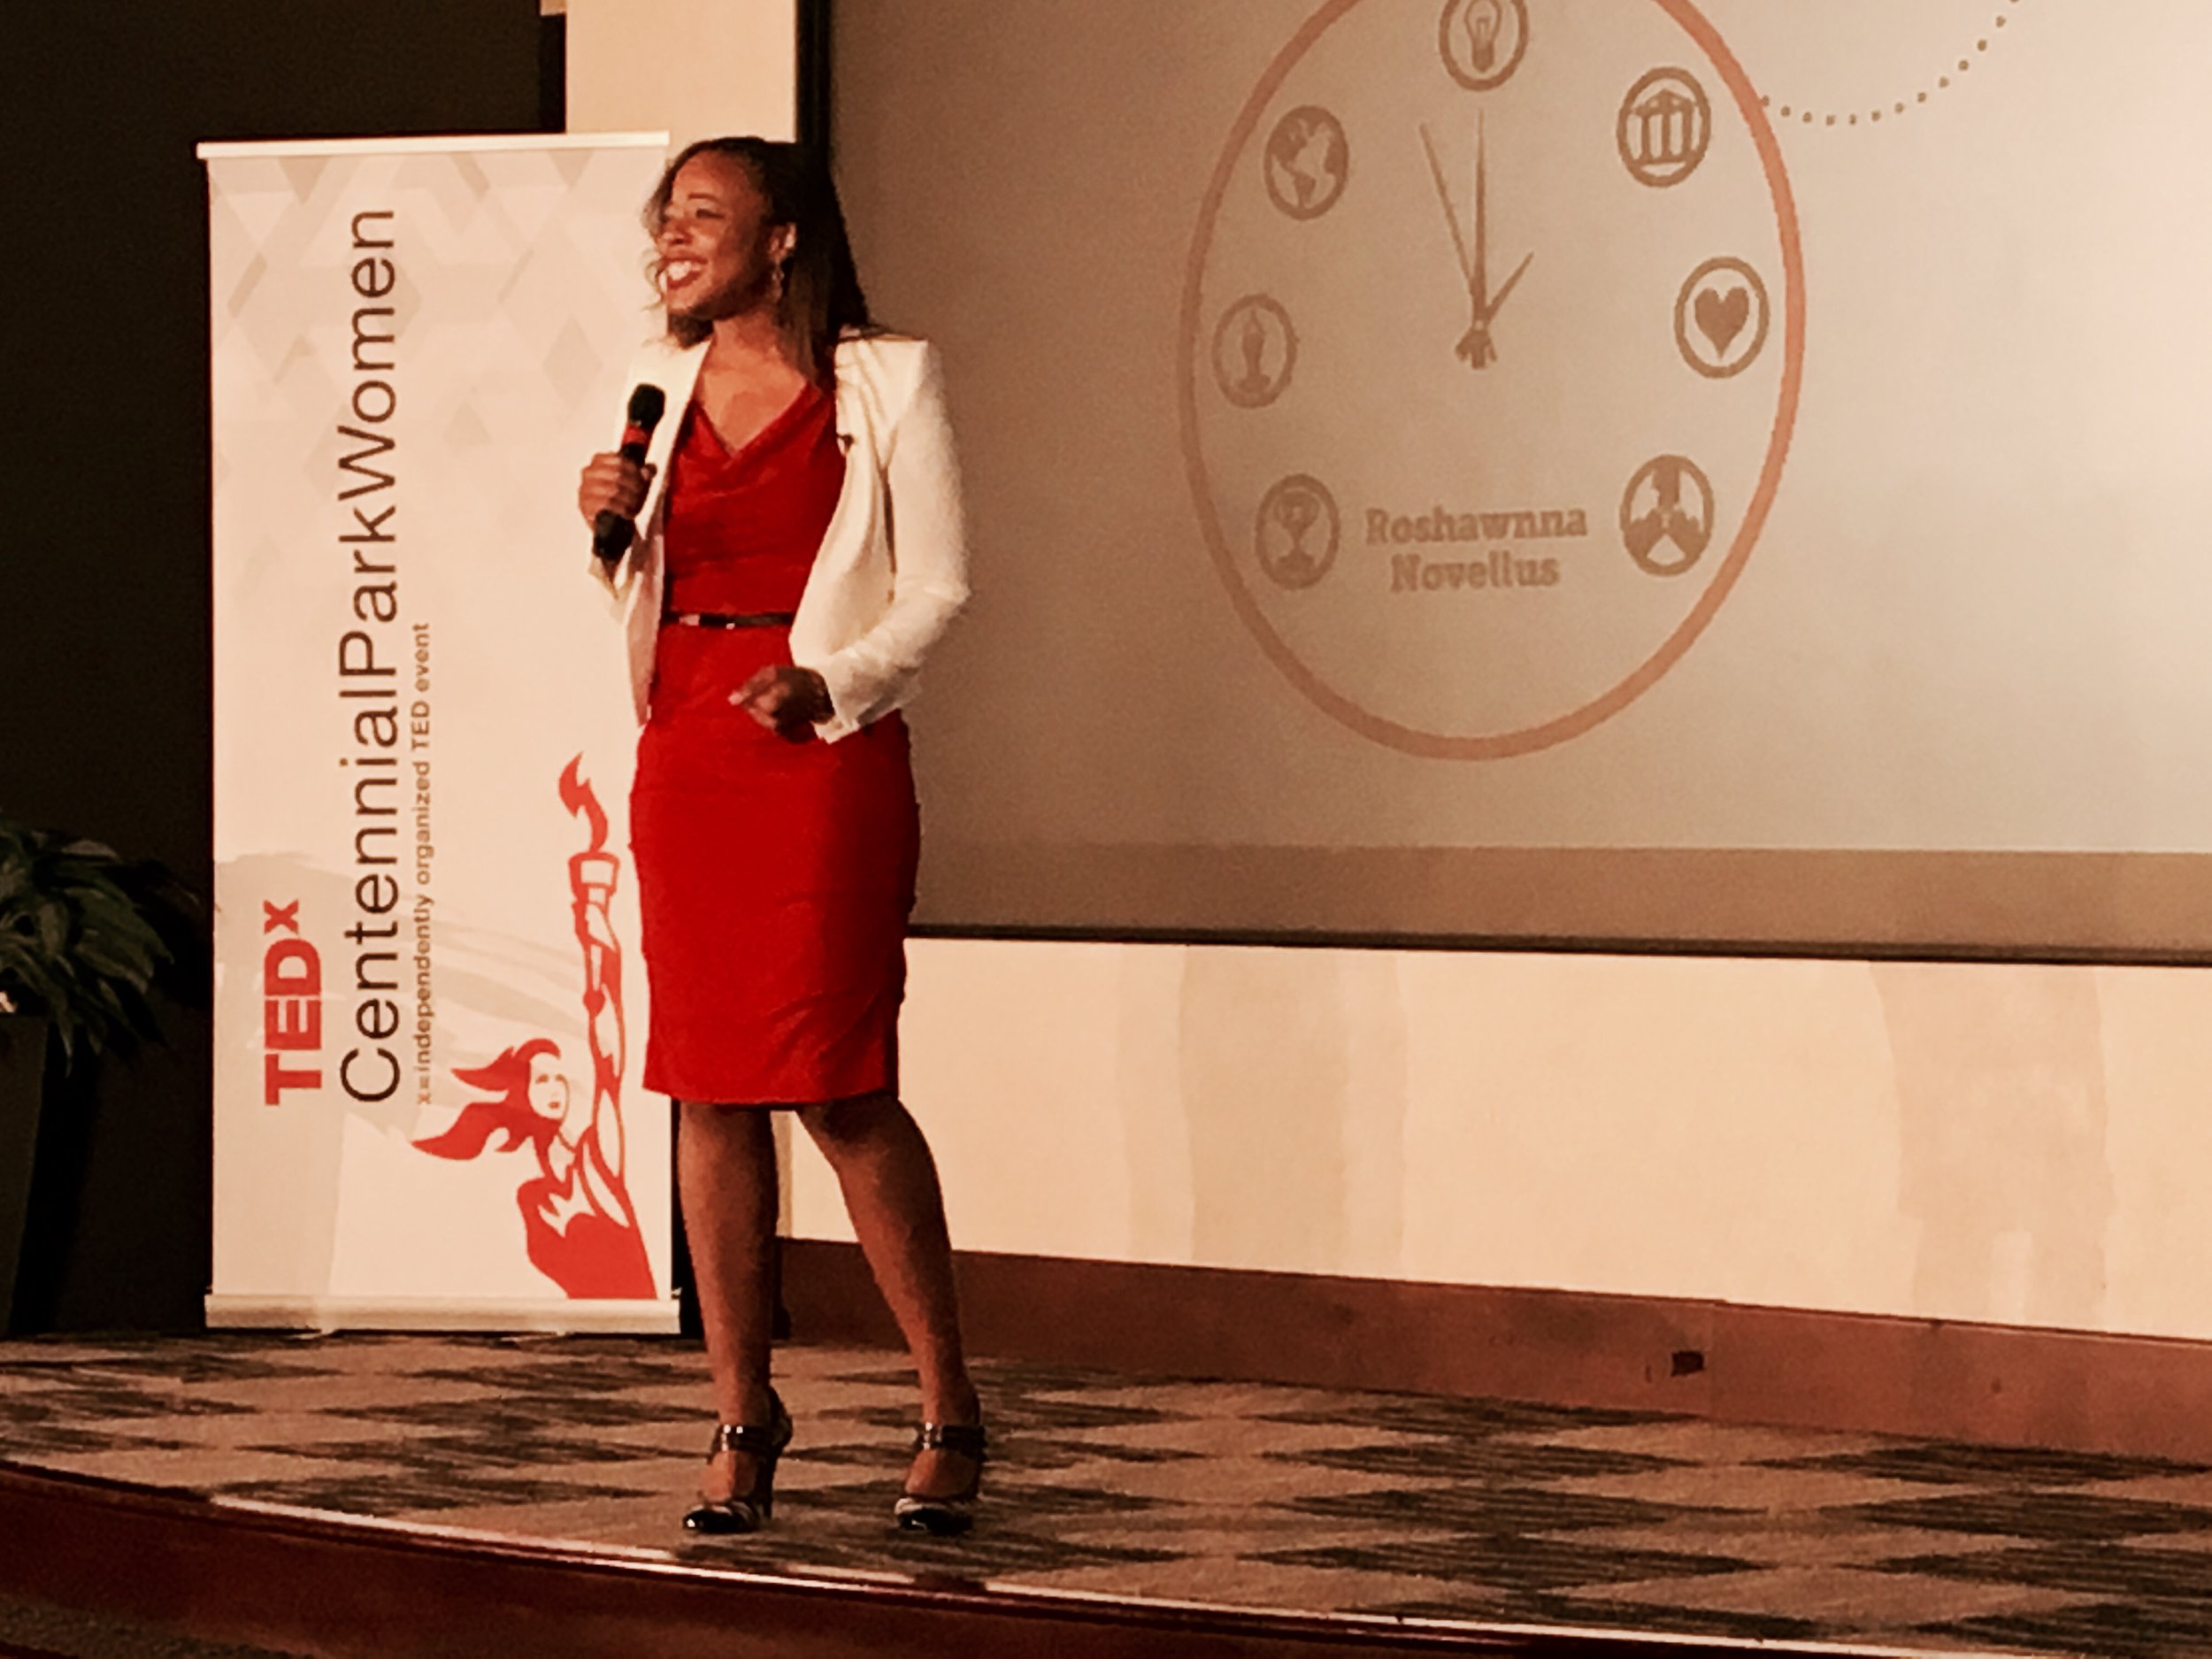 Dr. Roshawnna Novellus, Host Startup Funding & Co-Founder Bootstrap Capital